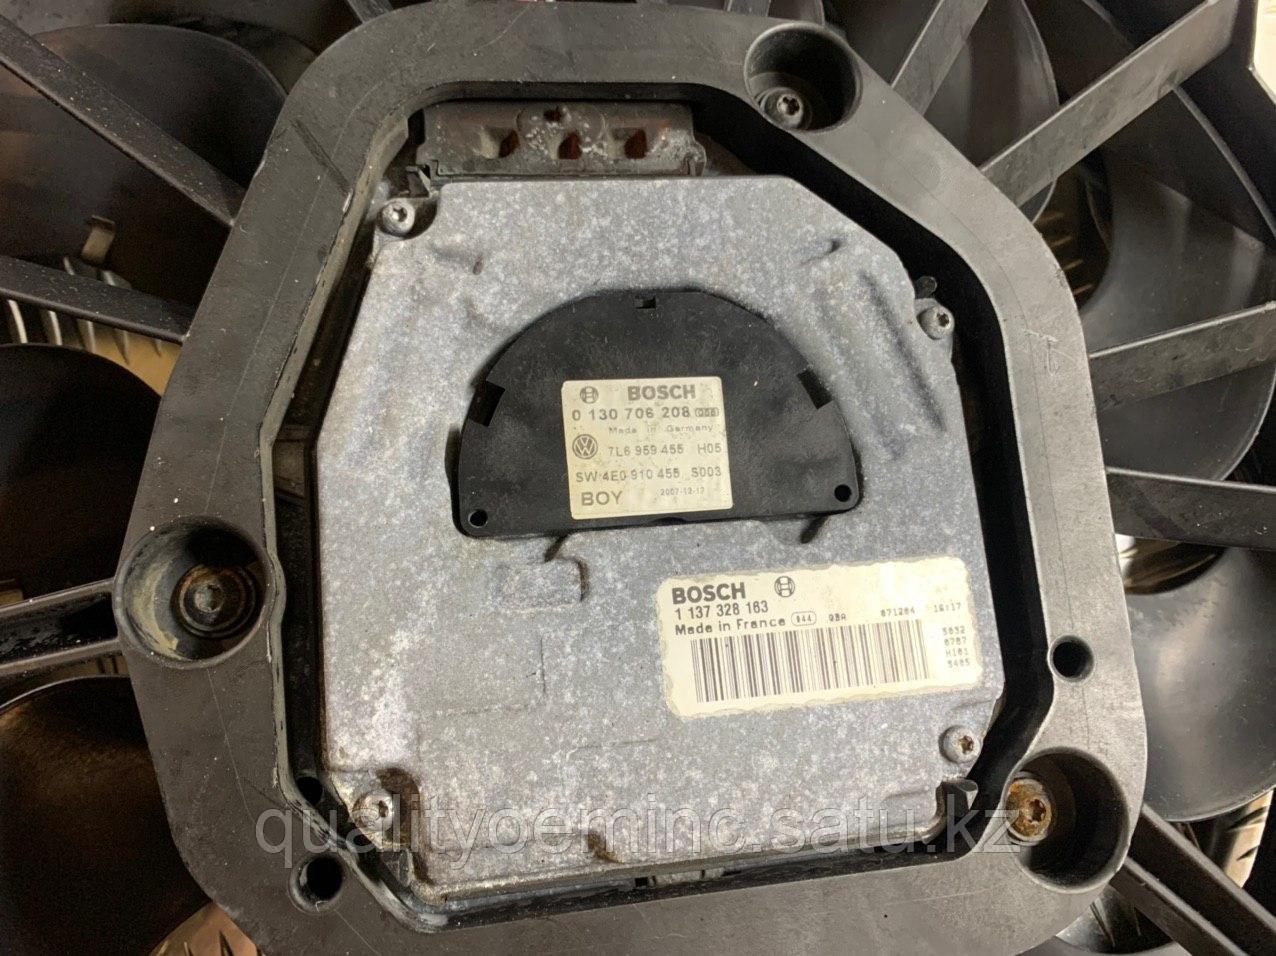 113728163 - ДВИГАТЕЛЬ ВЕНТИЛЯТОРА РАДИАТОРА Audi Q7 (4L)